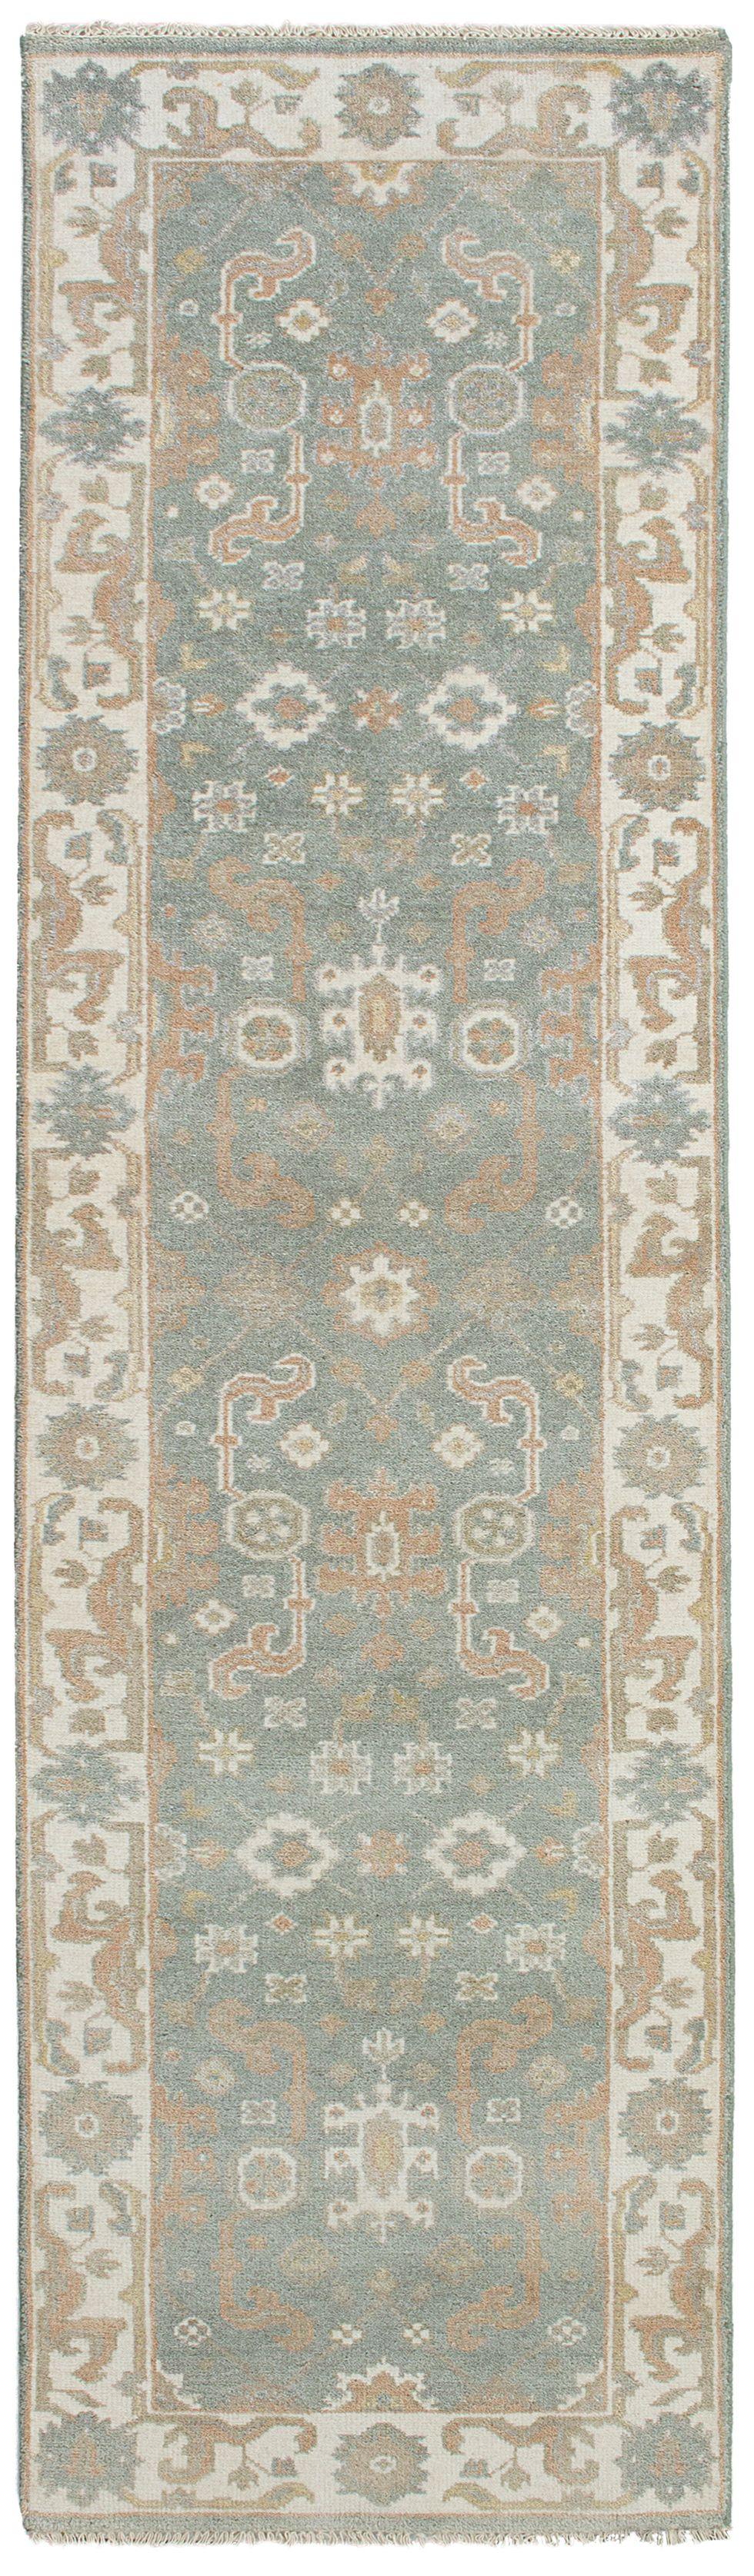 "Hand-knotted Royal Ushak Light Denim Blue Wool Rug 2'7"" x 9'11"" Size: 2'7"" x 9'11"""